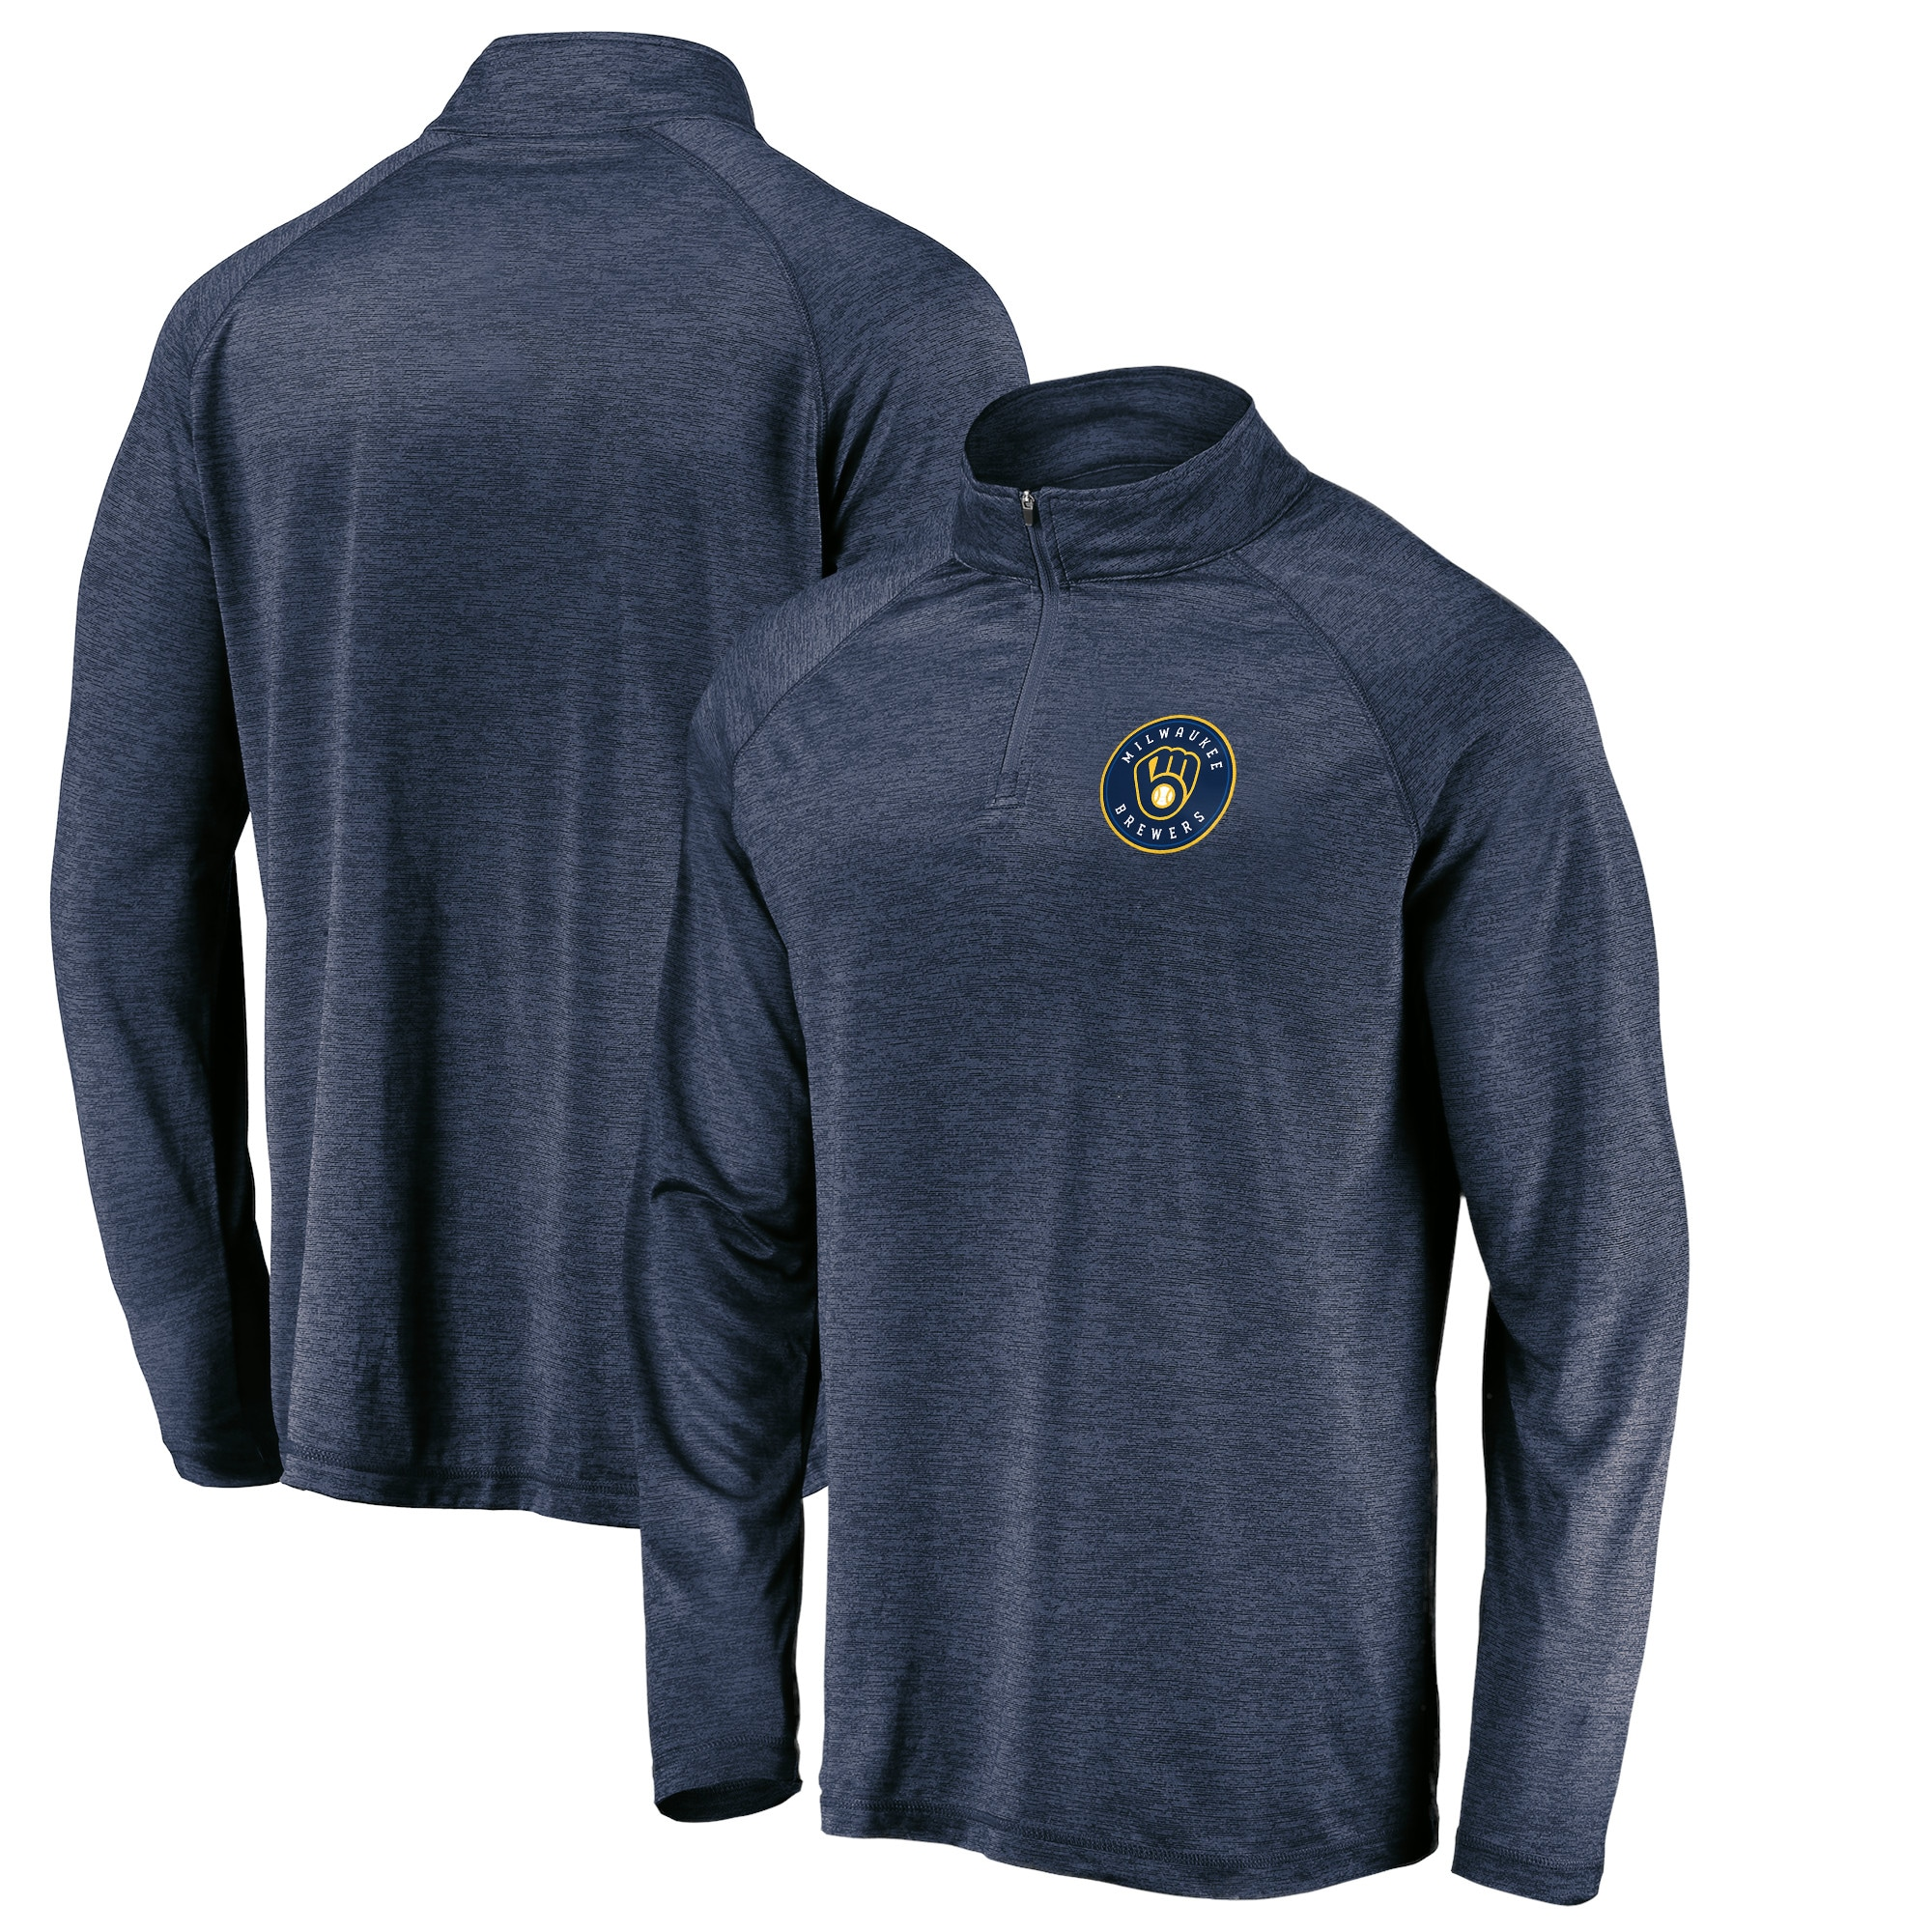 Milwaukee Brewers Fanatics Branded Iconic Striated Primary Logo Raglan Quarter-Zip Pullover Jacket - Navy